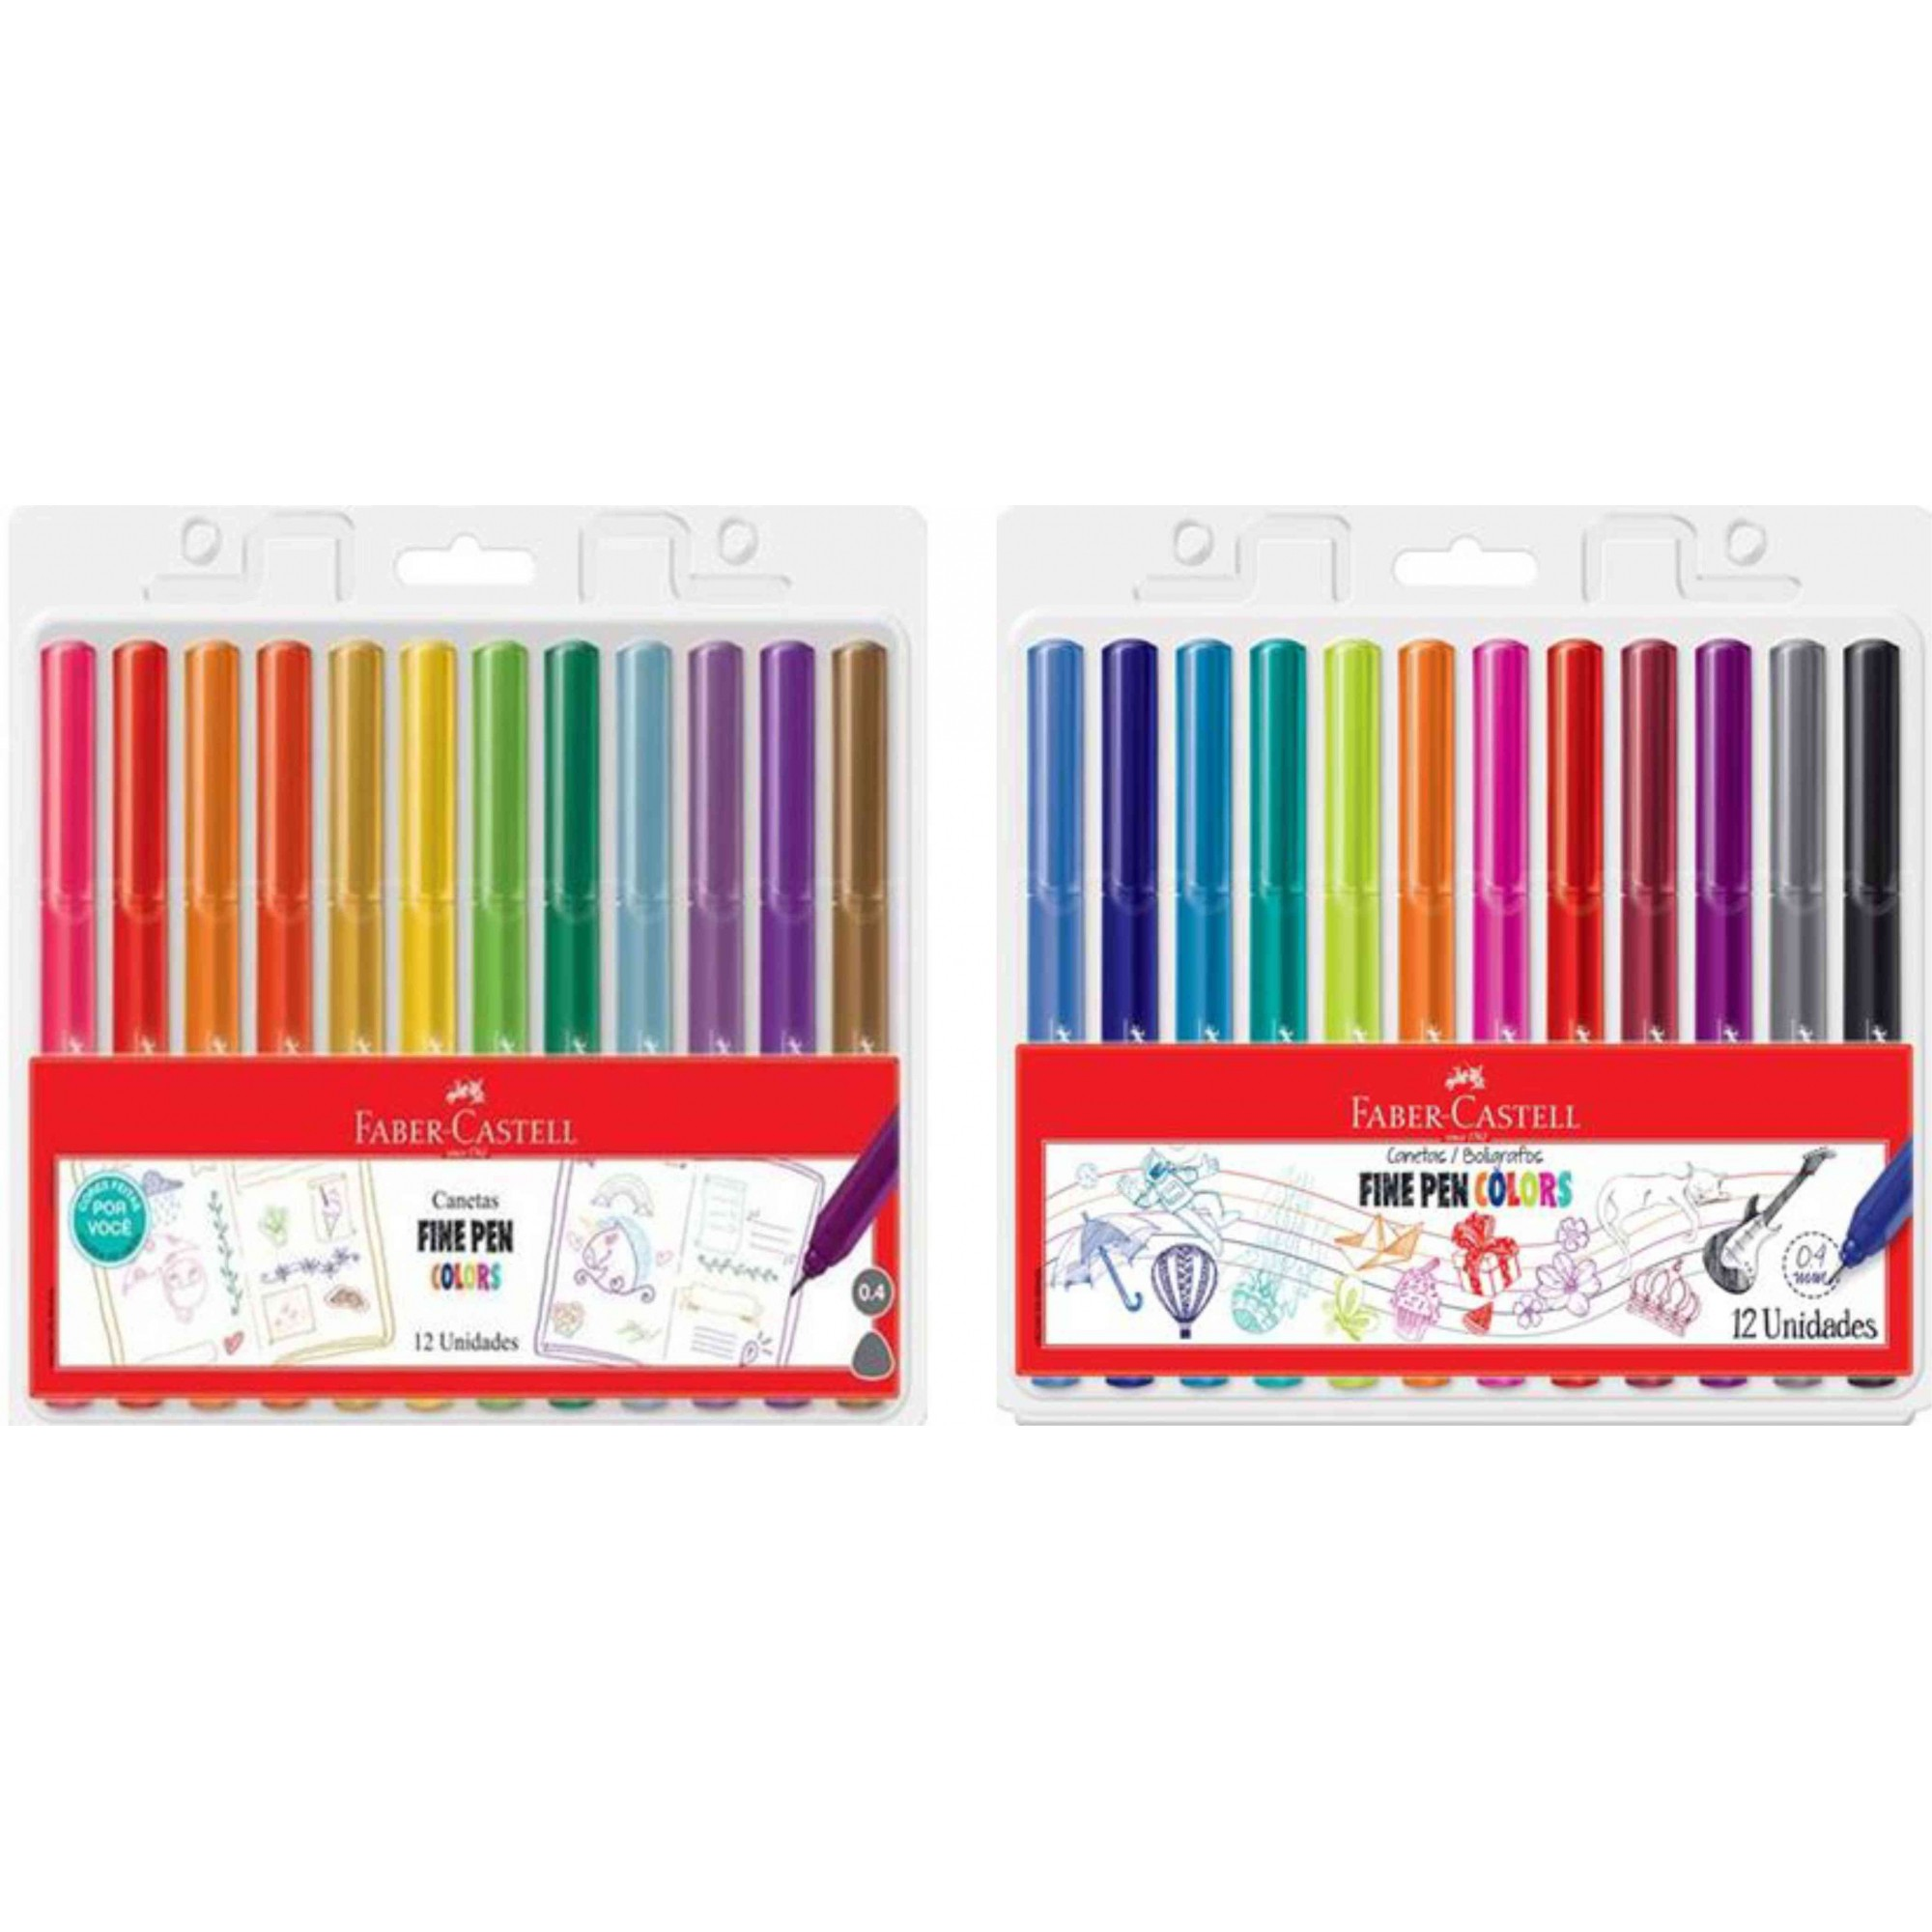 Caneta Fine Pen Faber Castell 12 Cores